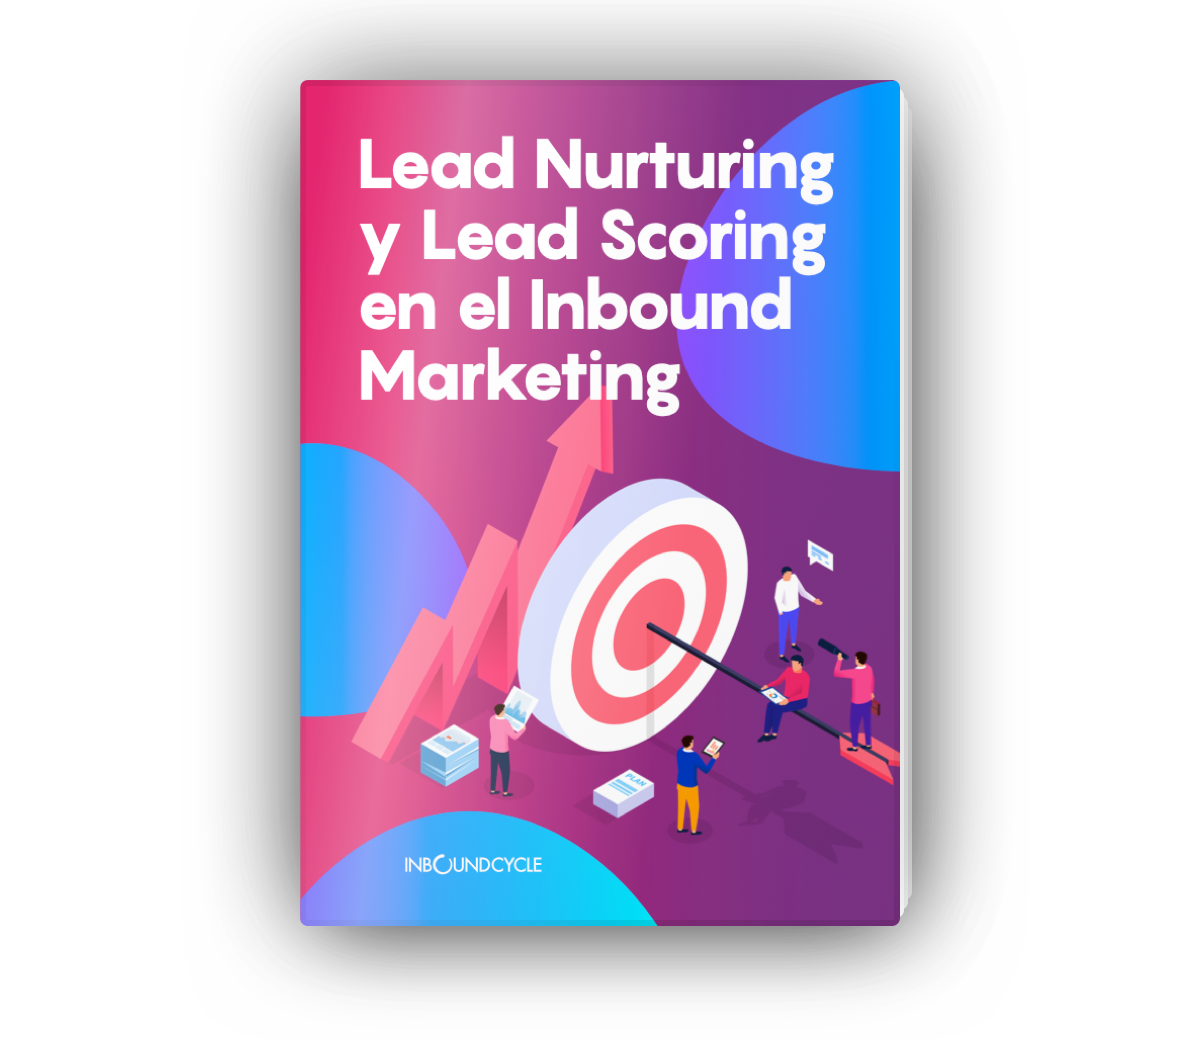 Portada - Email - Lead NUrturing y Lead scoring